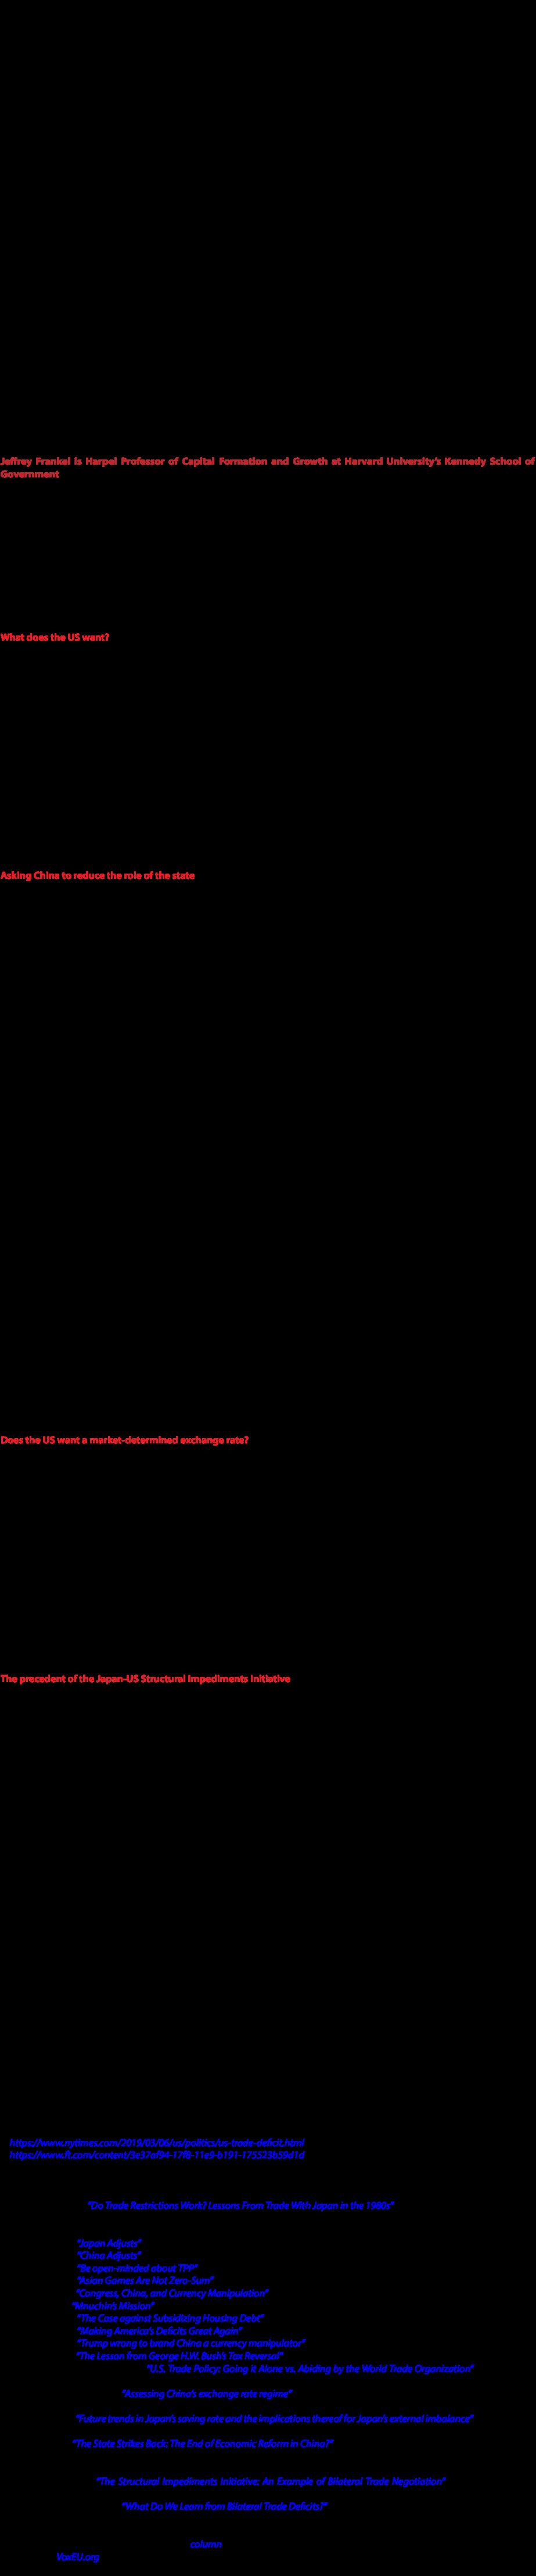 Ieltsonlinetests recent model of computer services